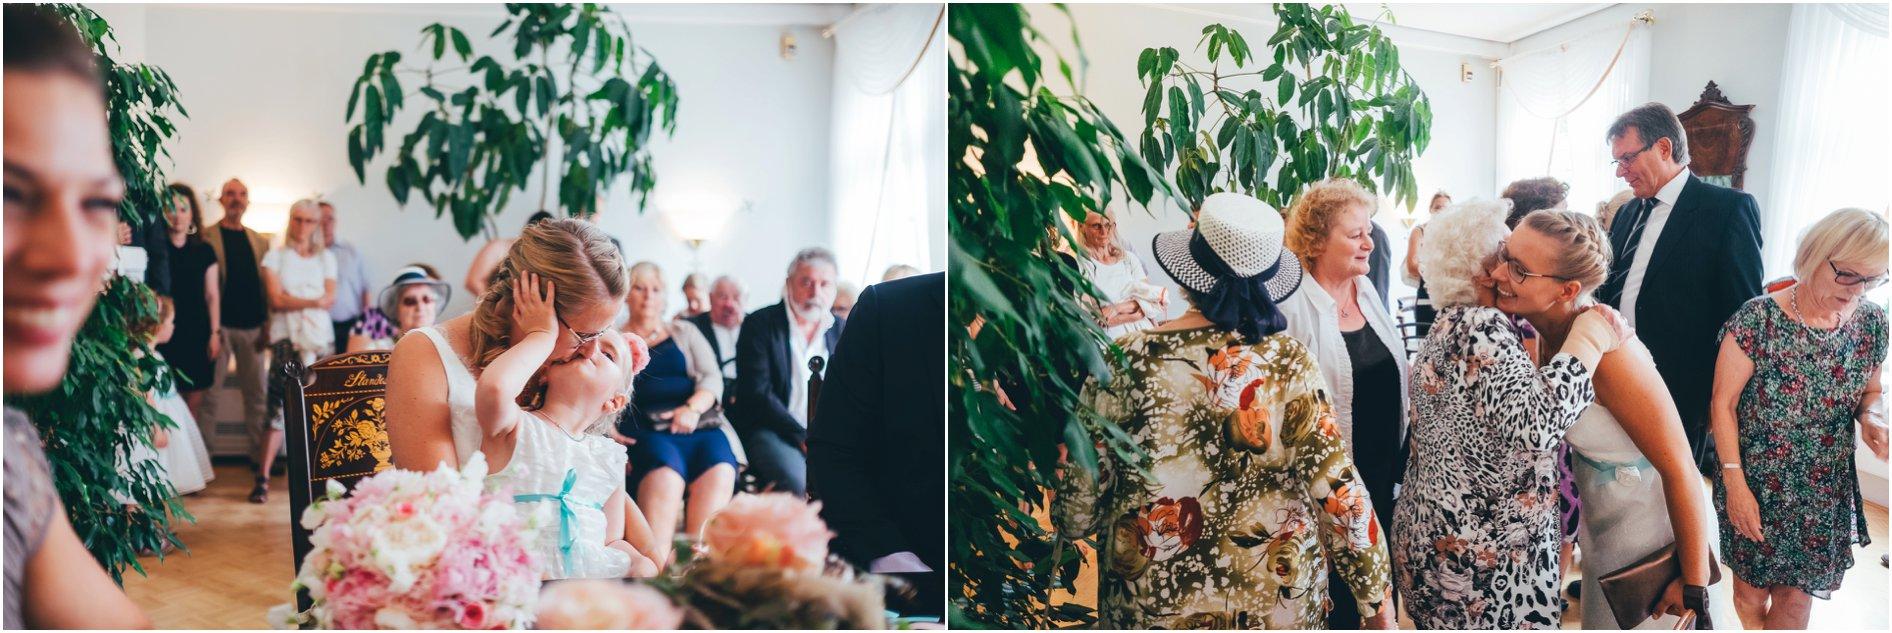 2016-04-19_0029 Sandra & Janis - Hochzeitsfotograf in Seevetal